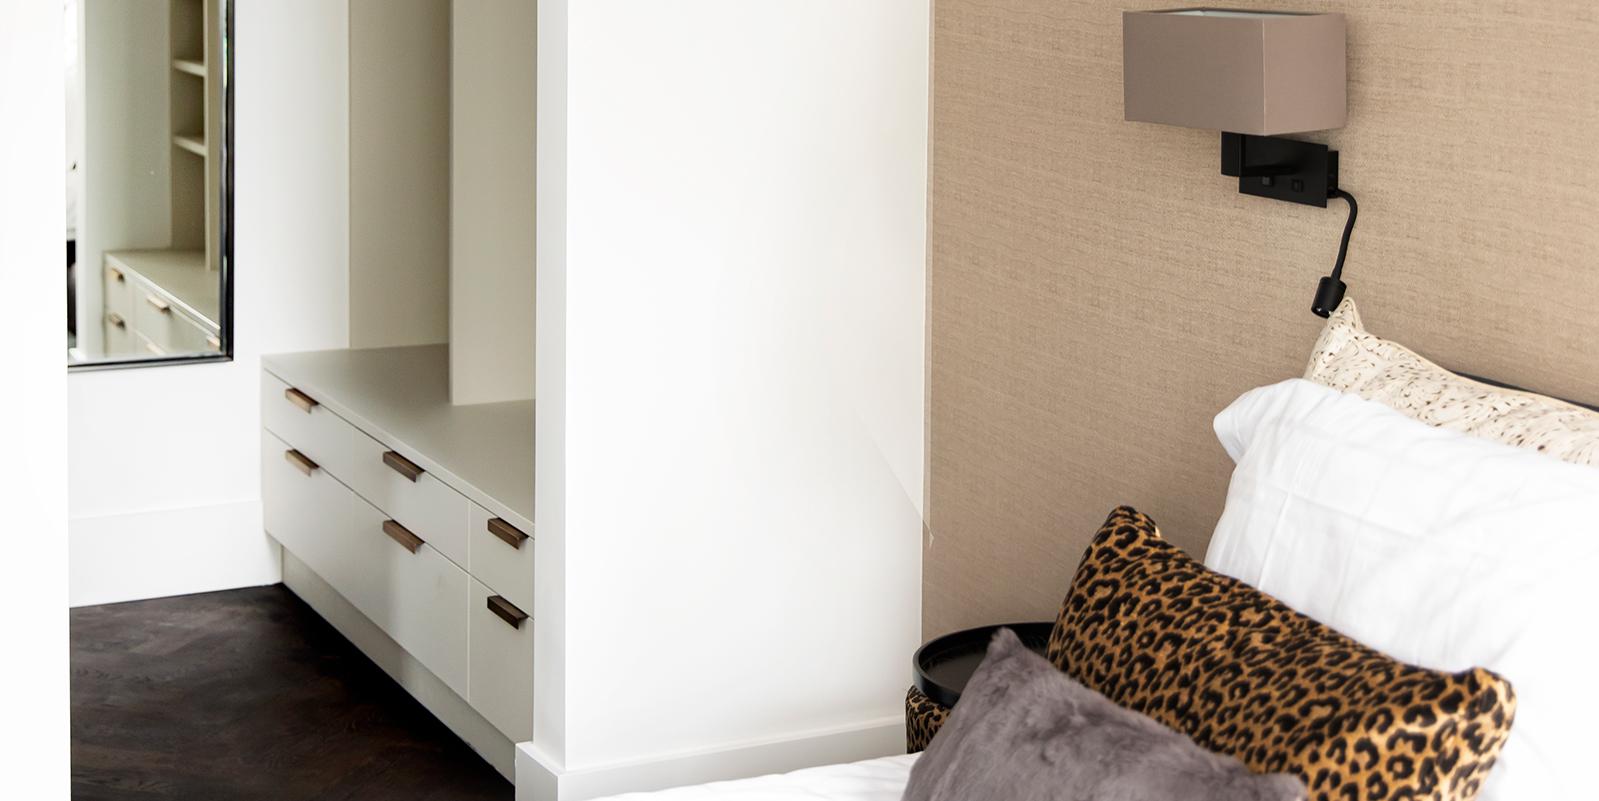 Dutch Walltextile Company, Clairz Interior Design, wandbekleding